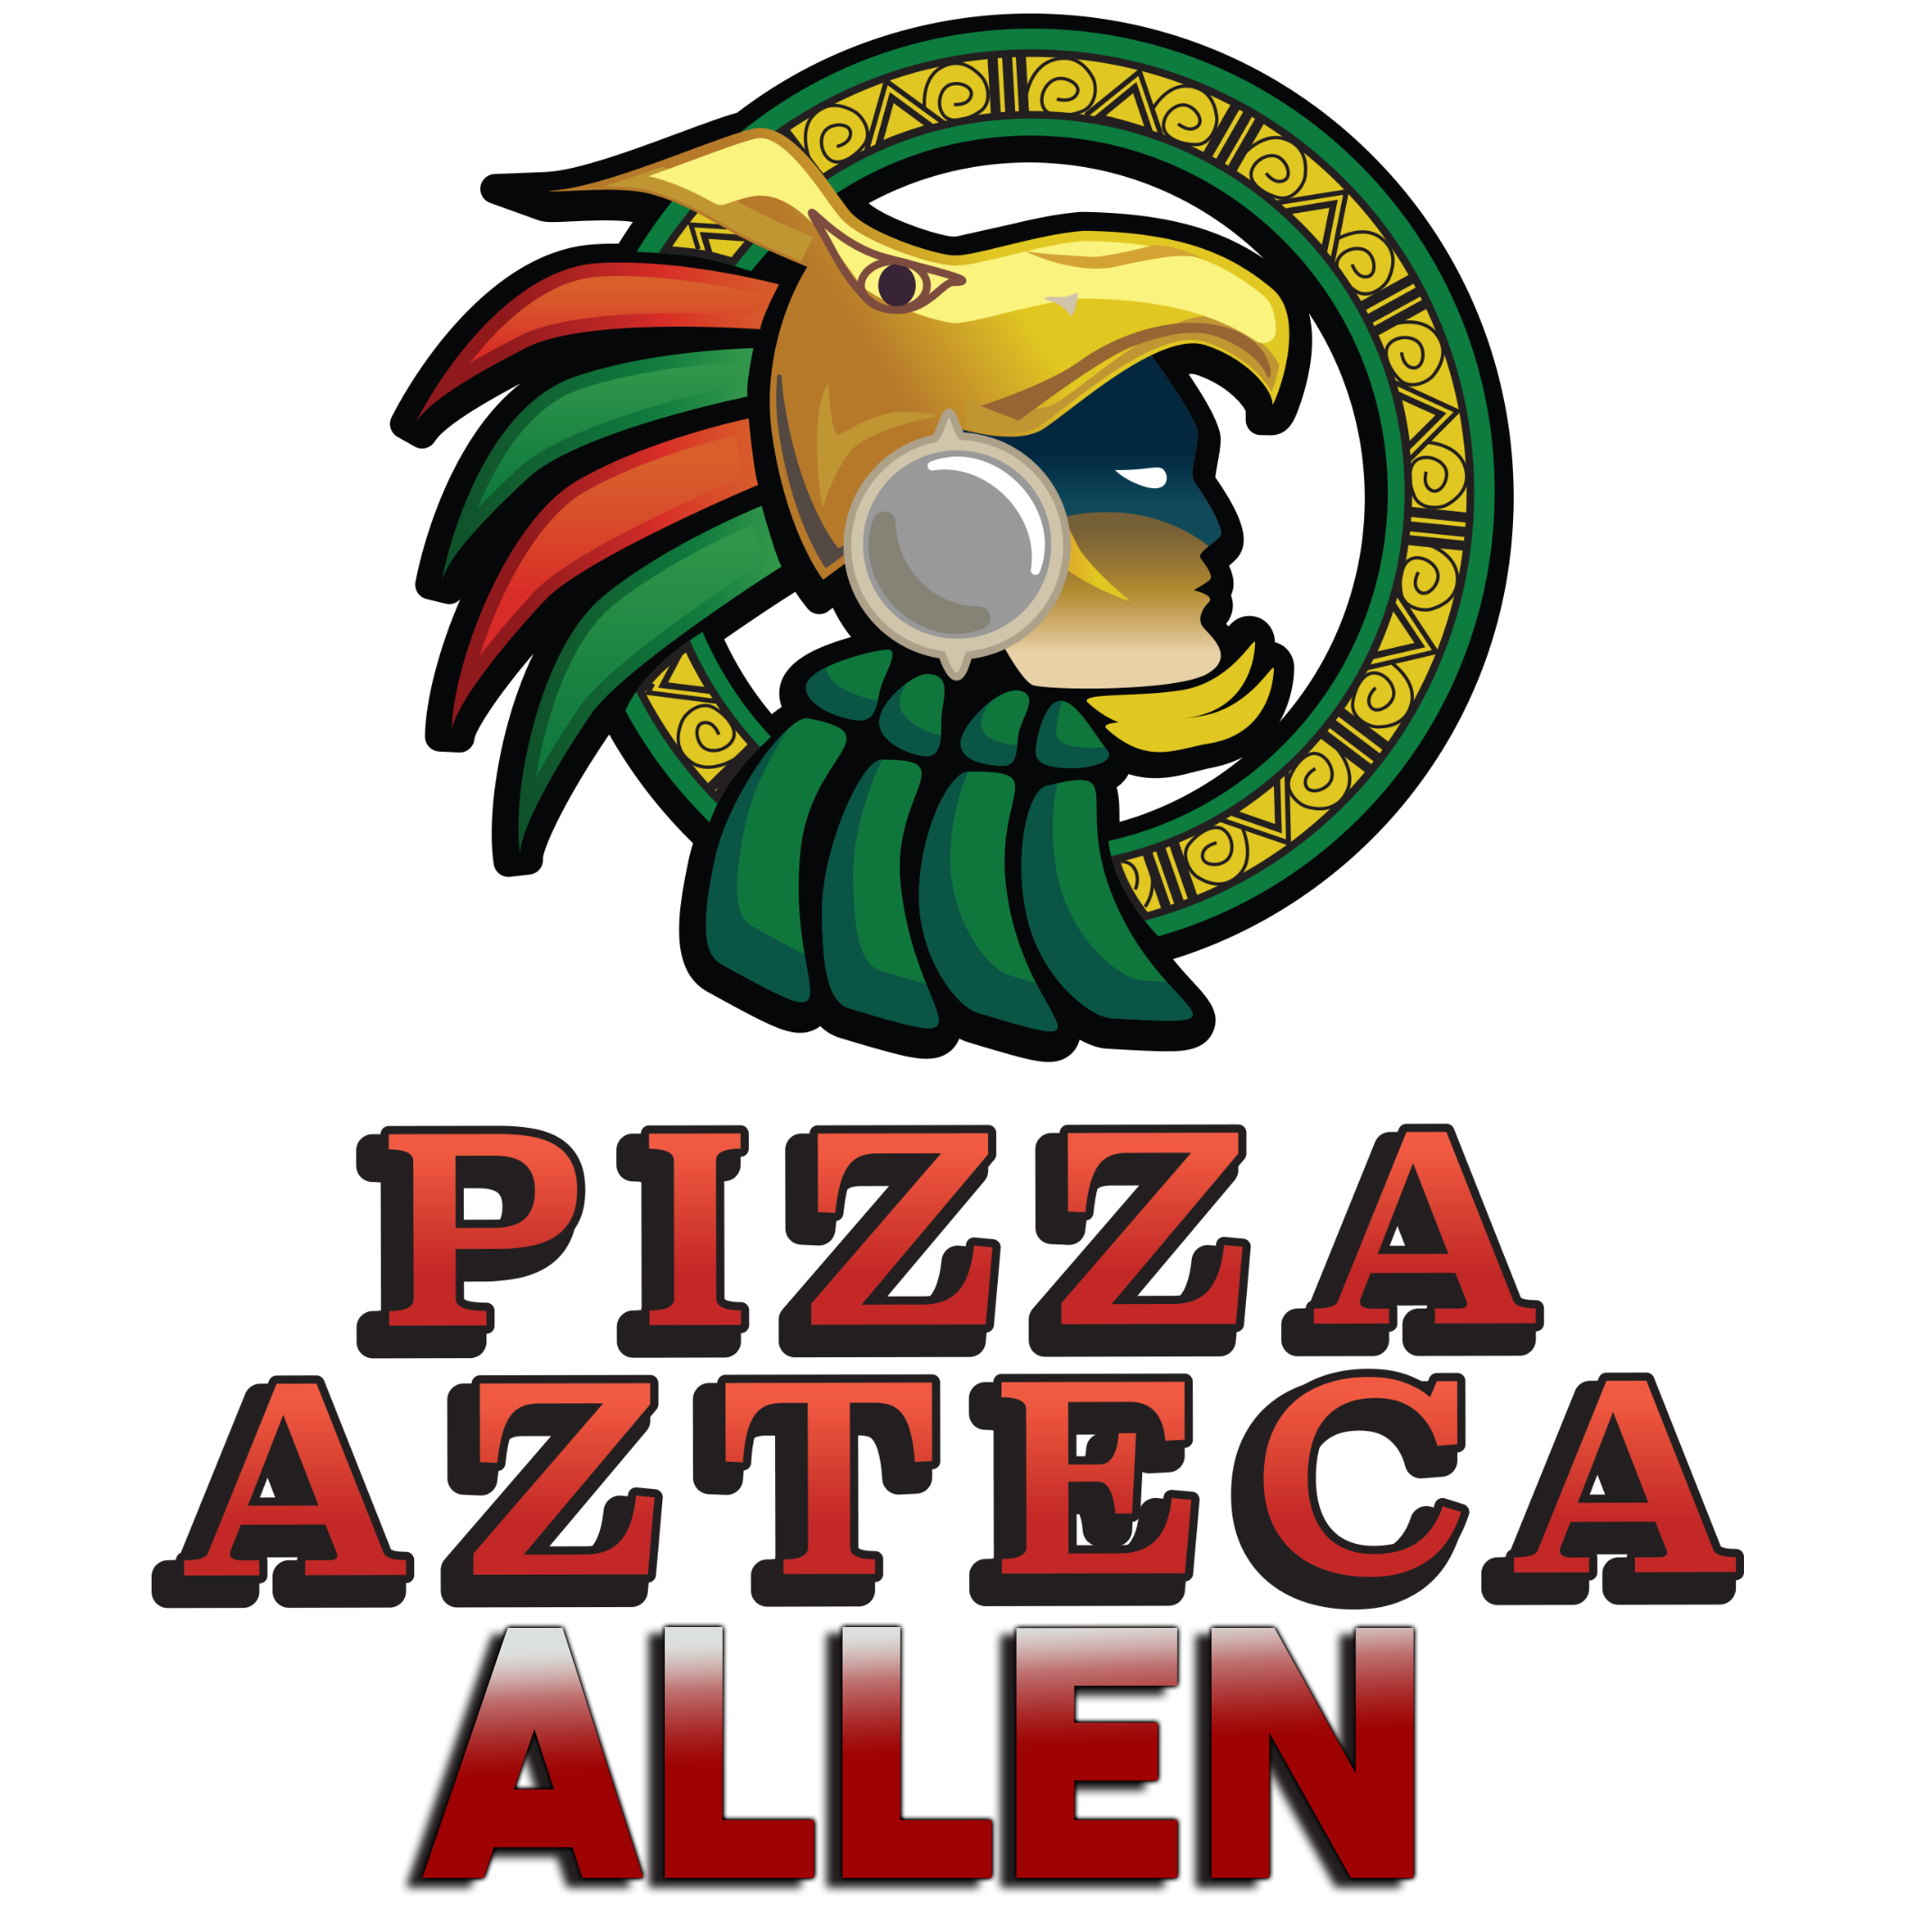 Pizza Azteca logo color